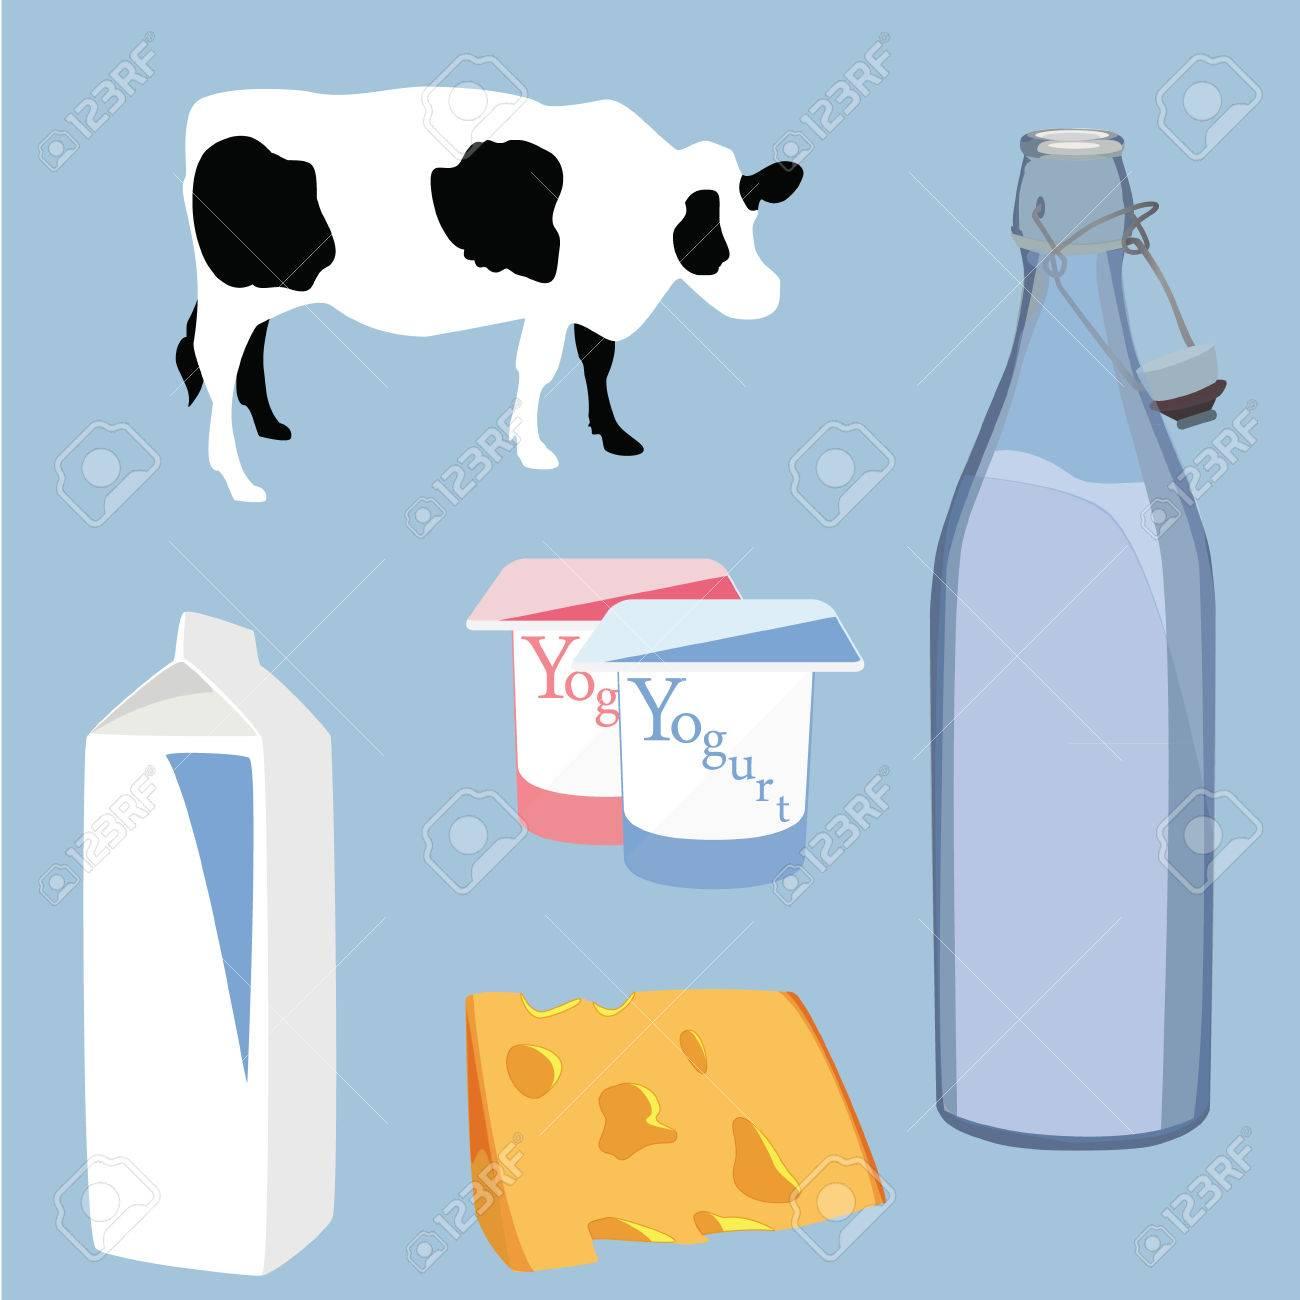 Vector illustration milk product icon set yogurt, cheese, milk and cow symbol on blue background - 45912699